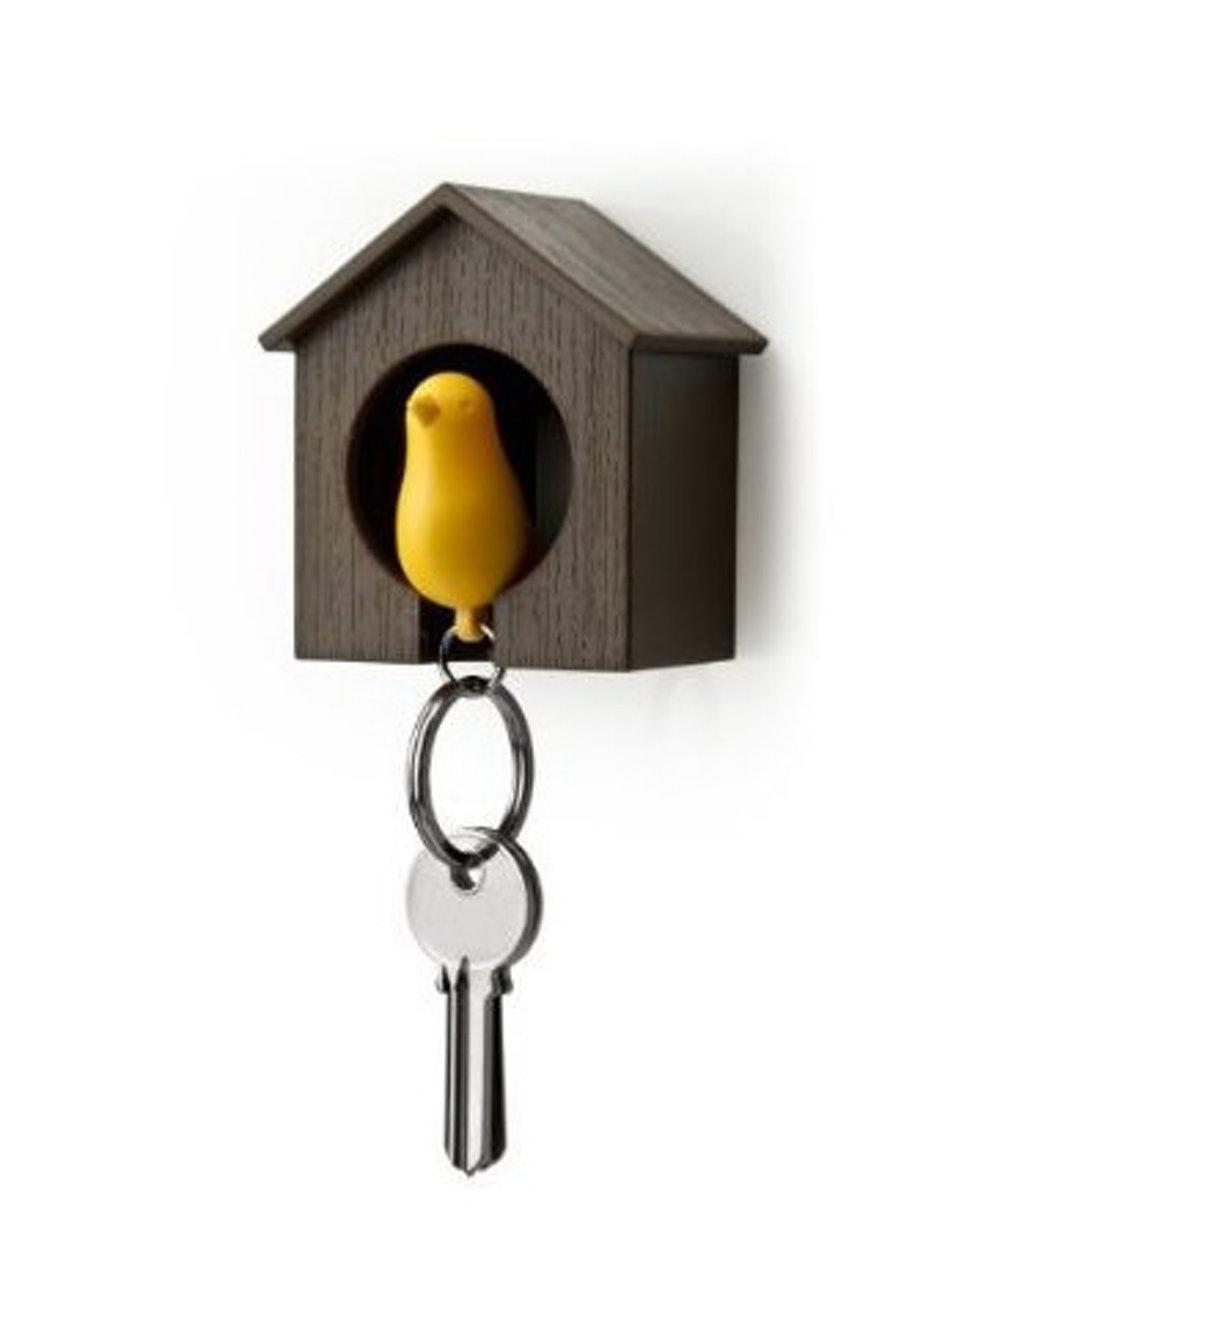 Eva Hand Painted Metal Bird House Bird House Elegant In Smell Green